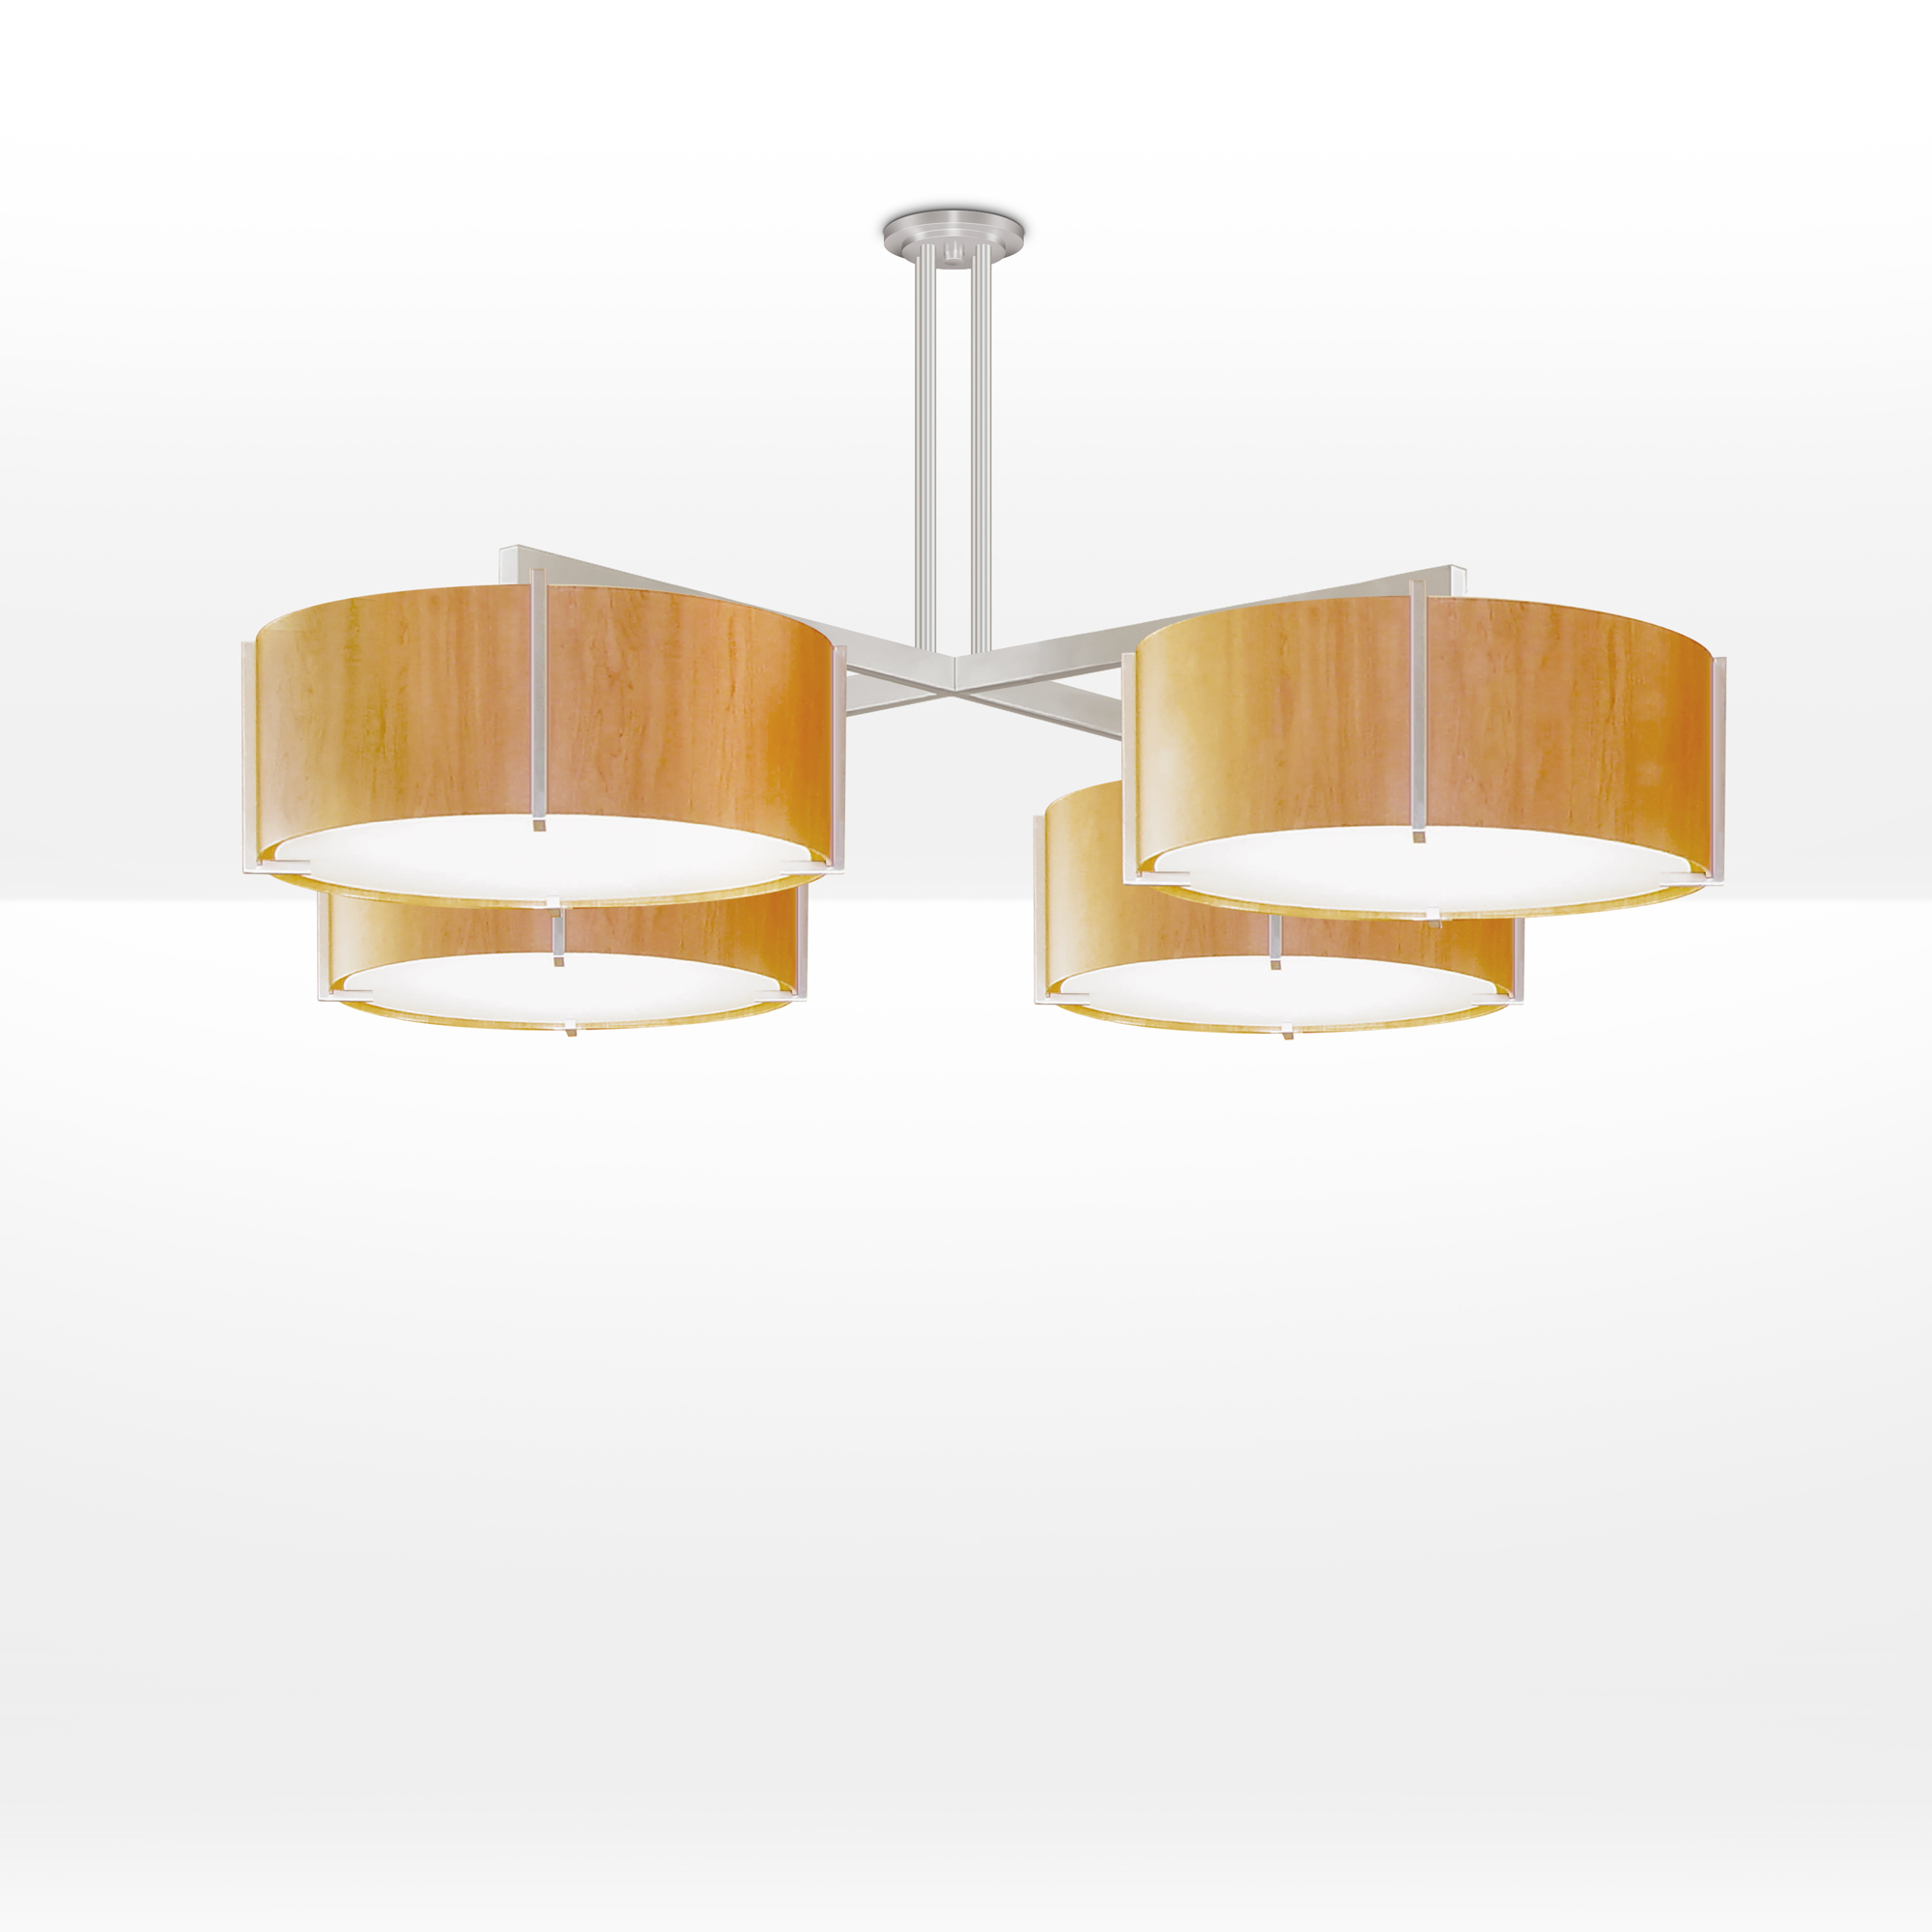 2719 4 Scott Lamp Company